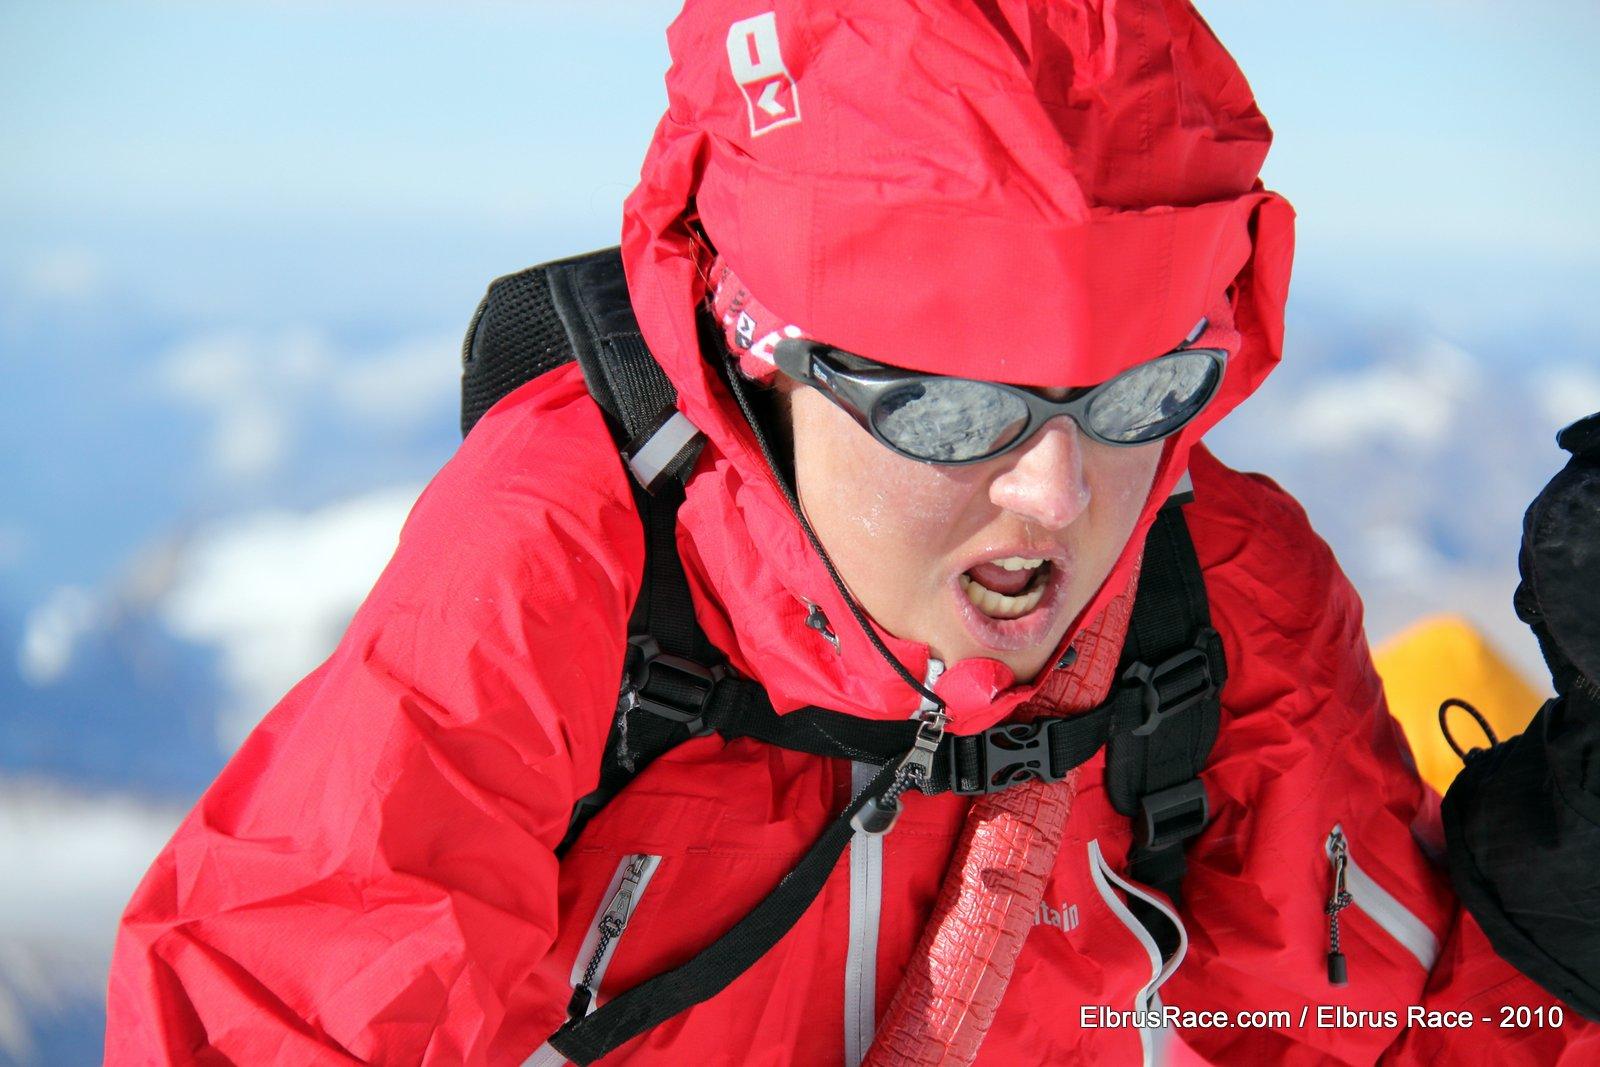 elbrus race 2010 - Ola - Aleksandra Dzik